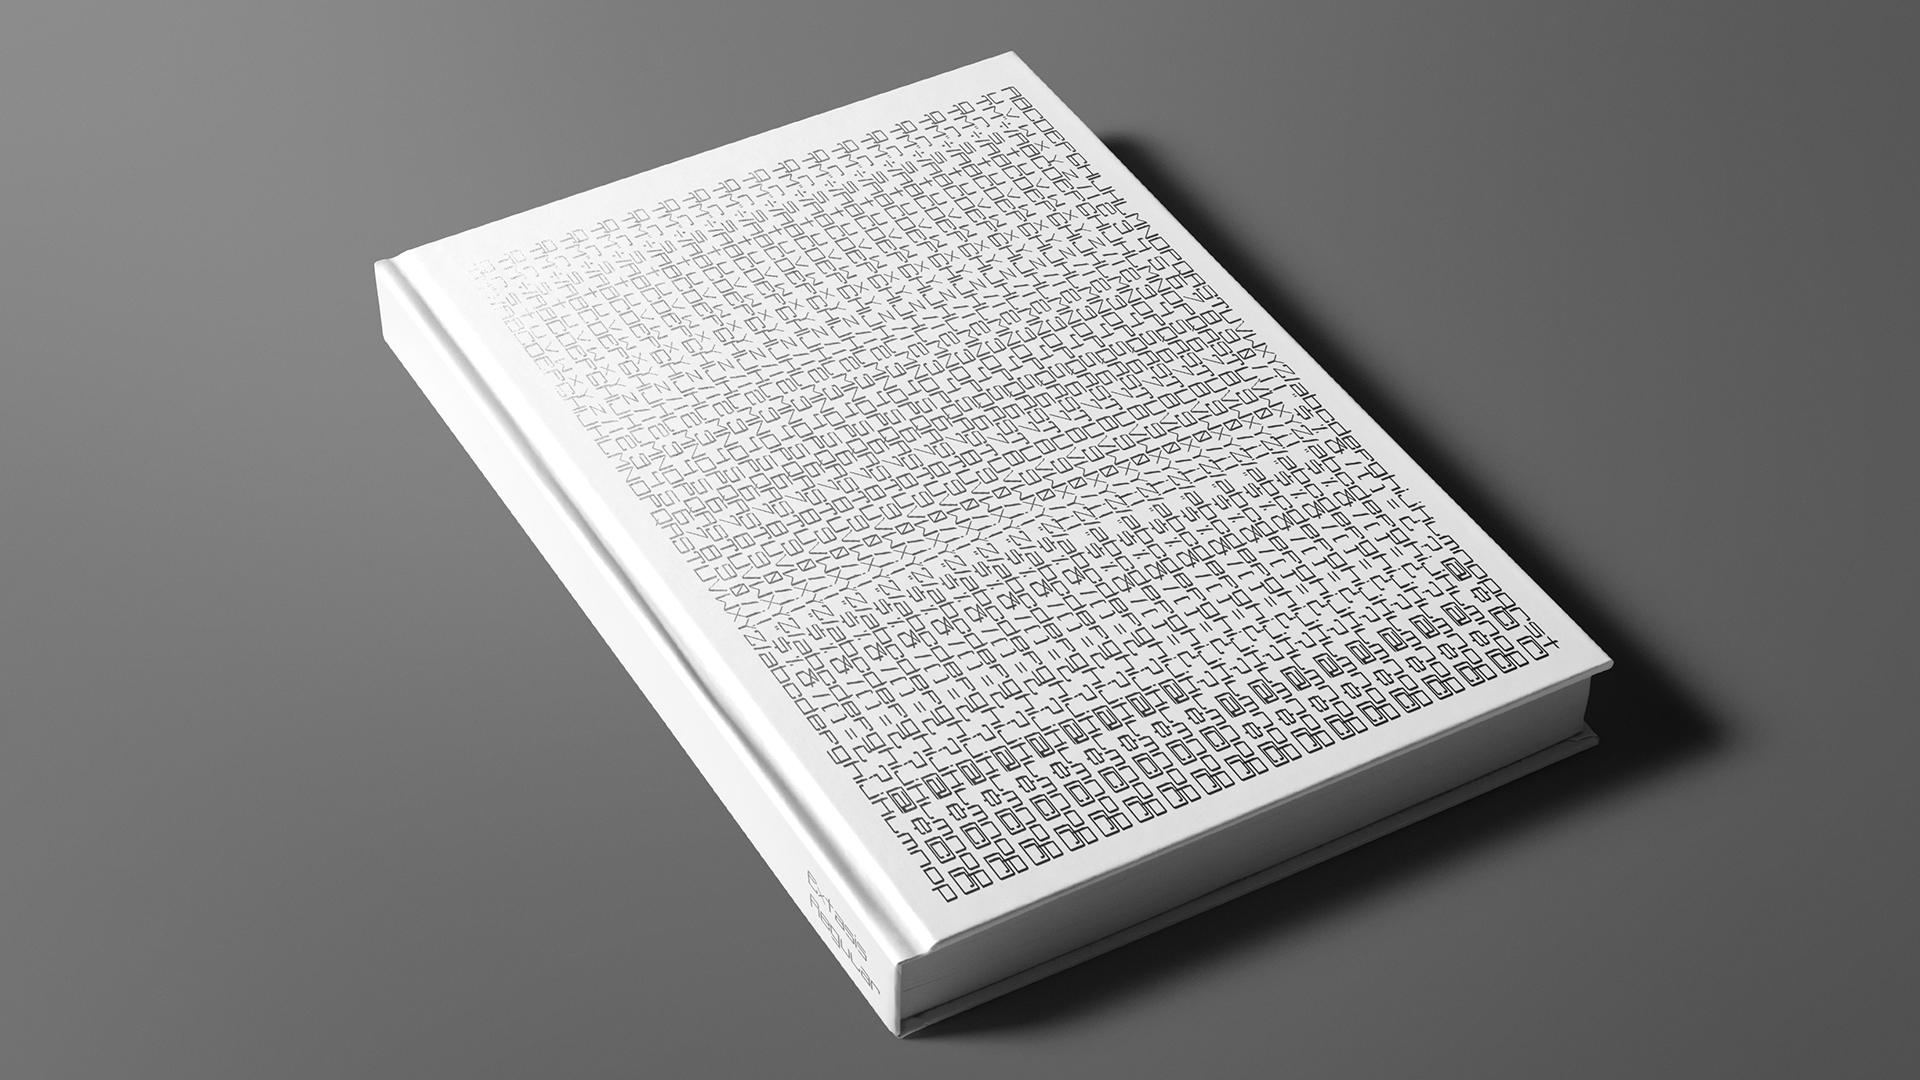 Extasis-Regular-FontBook.jpg